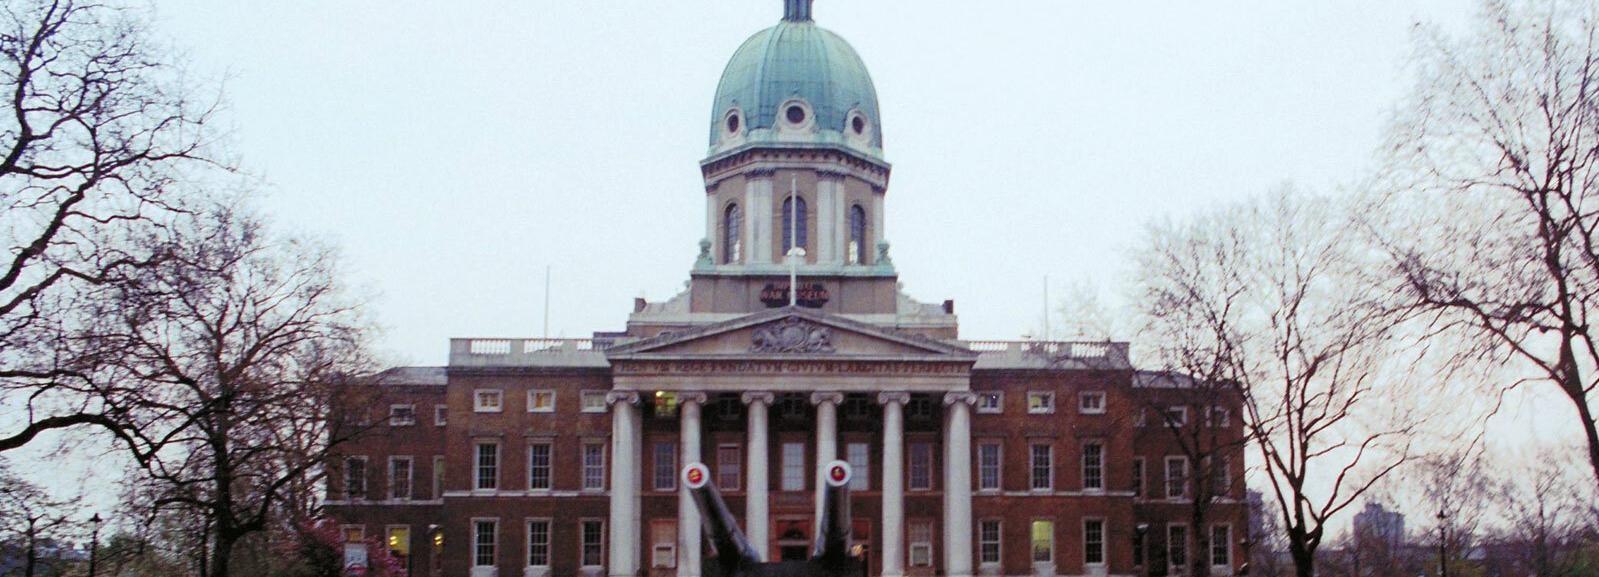 London: Churchill Blitz Walk & Imperial War Museum aus dem Zweiten Weltkrieg